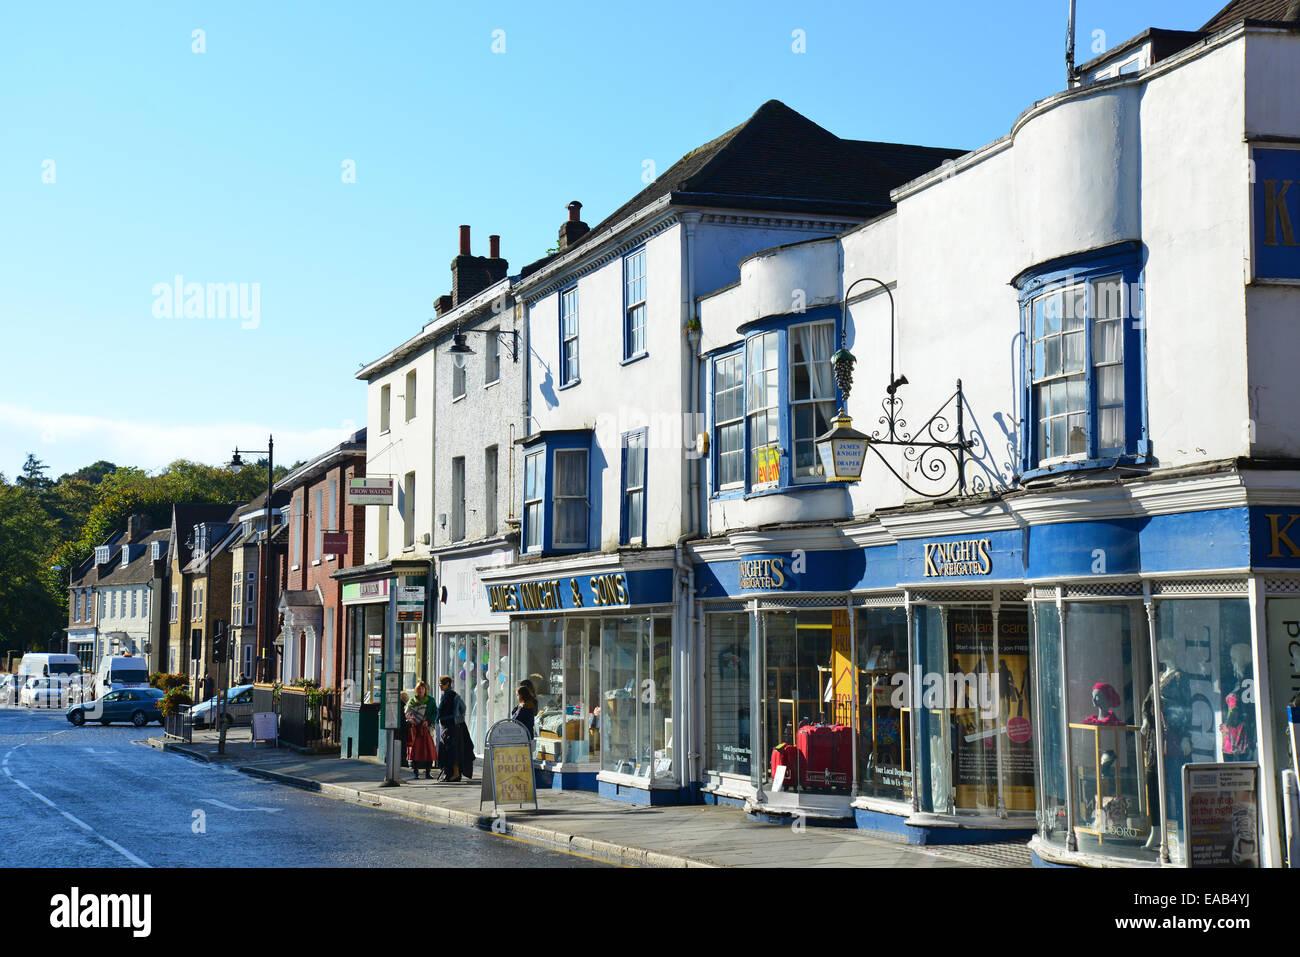 Bell Street, Reigate, Surrey, England, United Kingdom - Stock Image